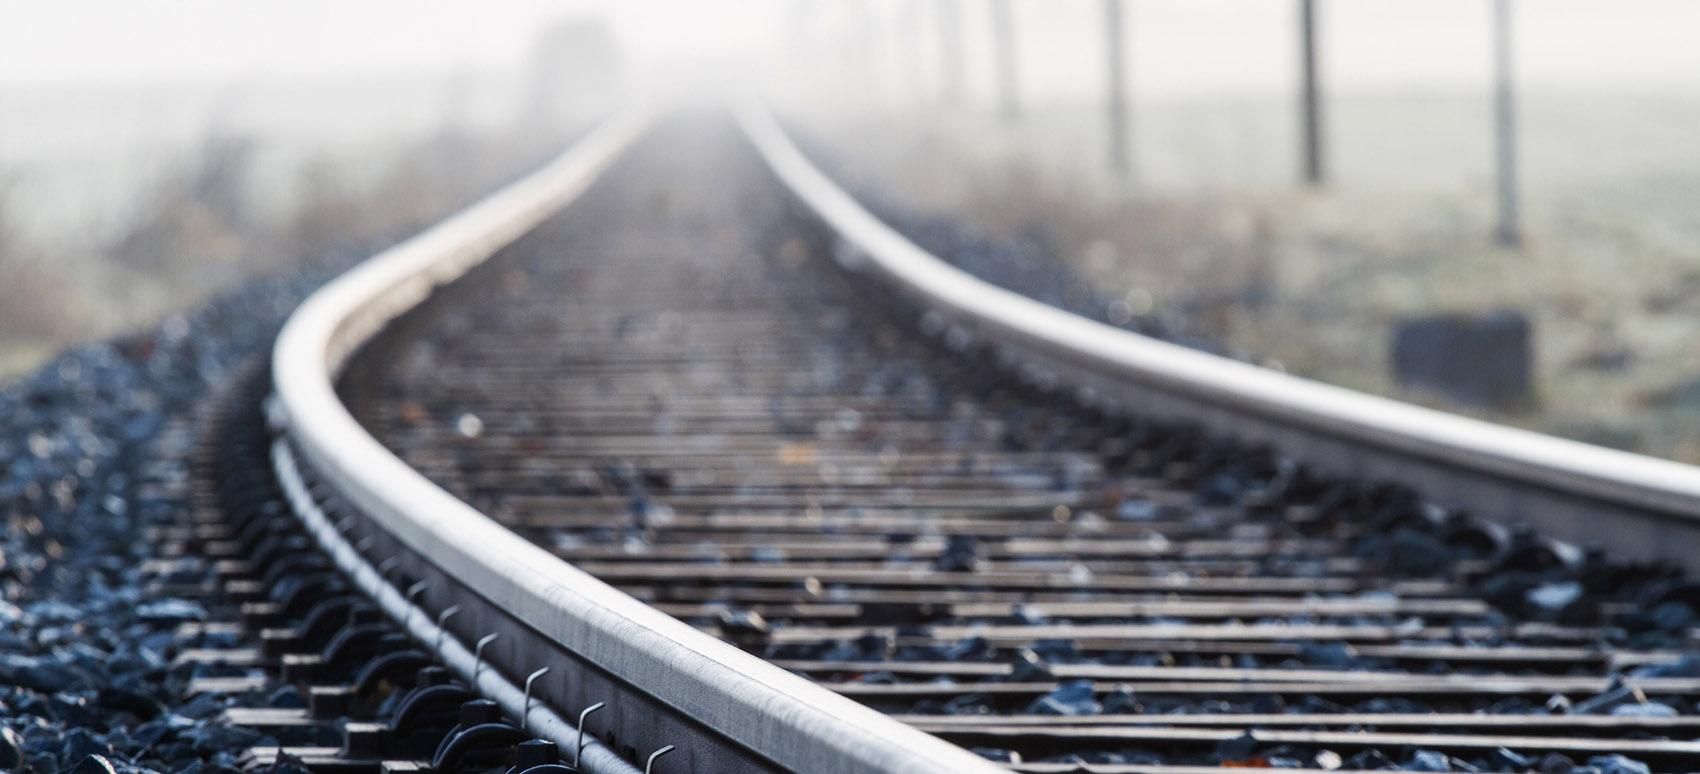 Rail transport in Europe